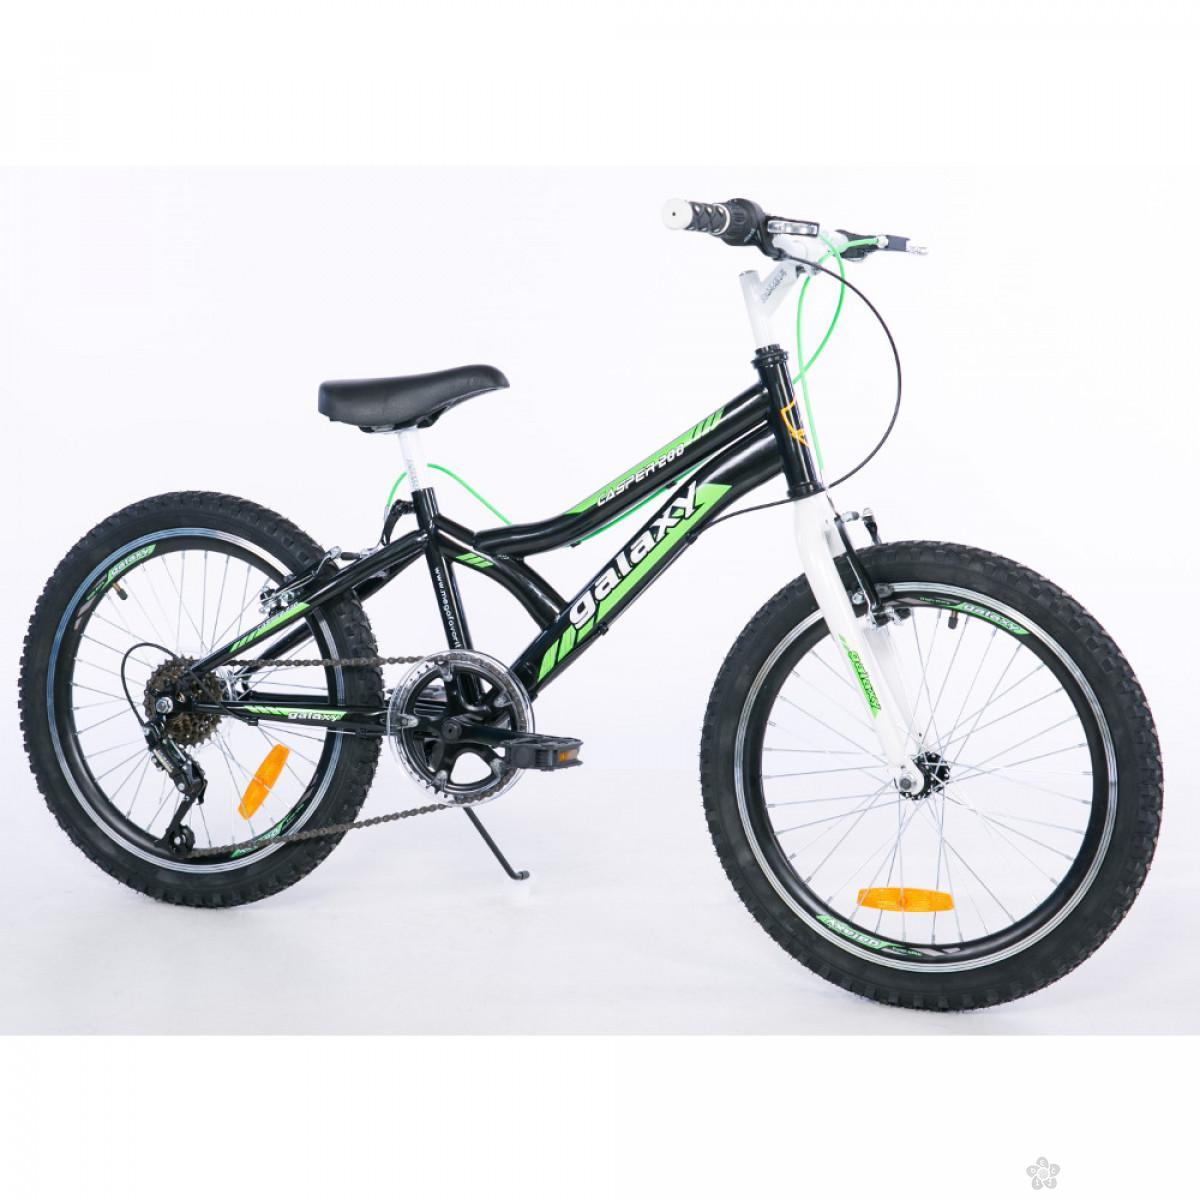 Dečiji Bicikl Casper 200,  20/6 crna/zelena, 650099